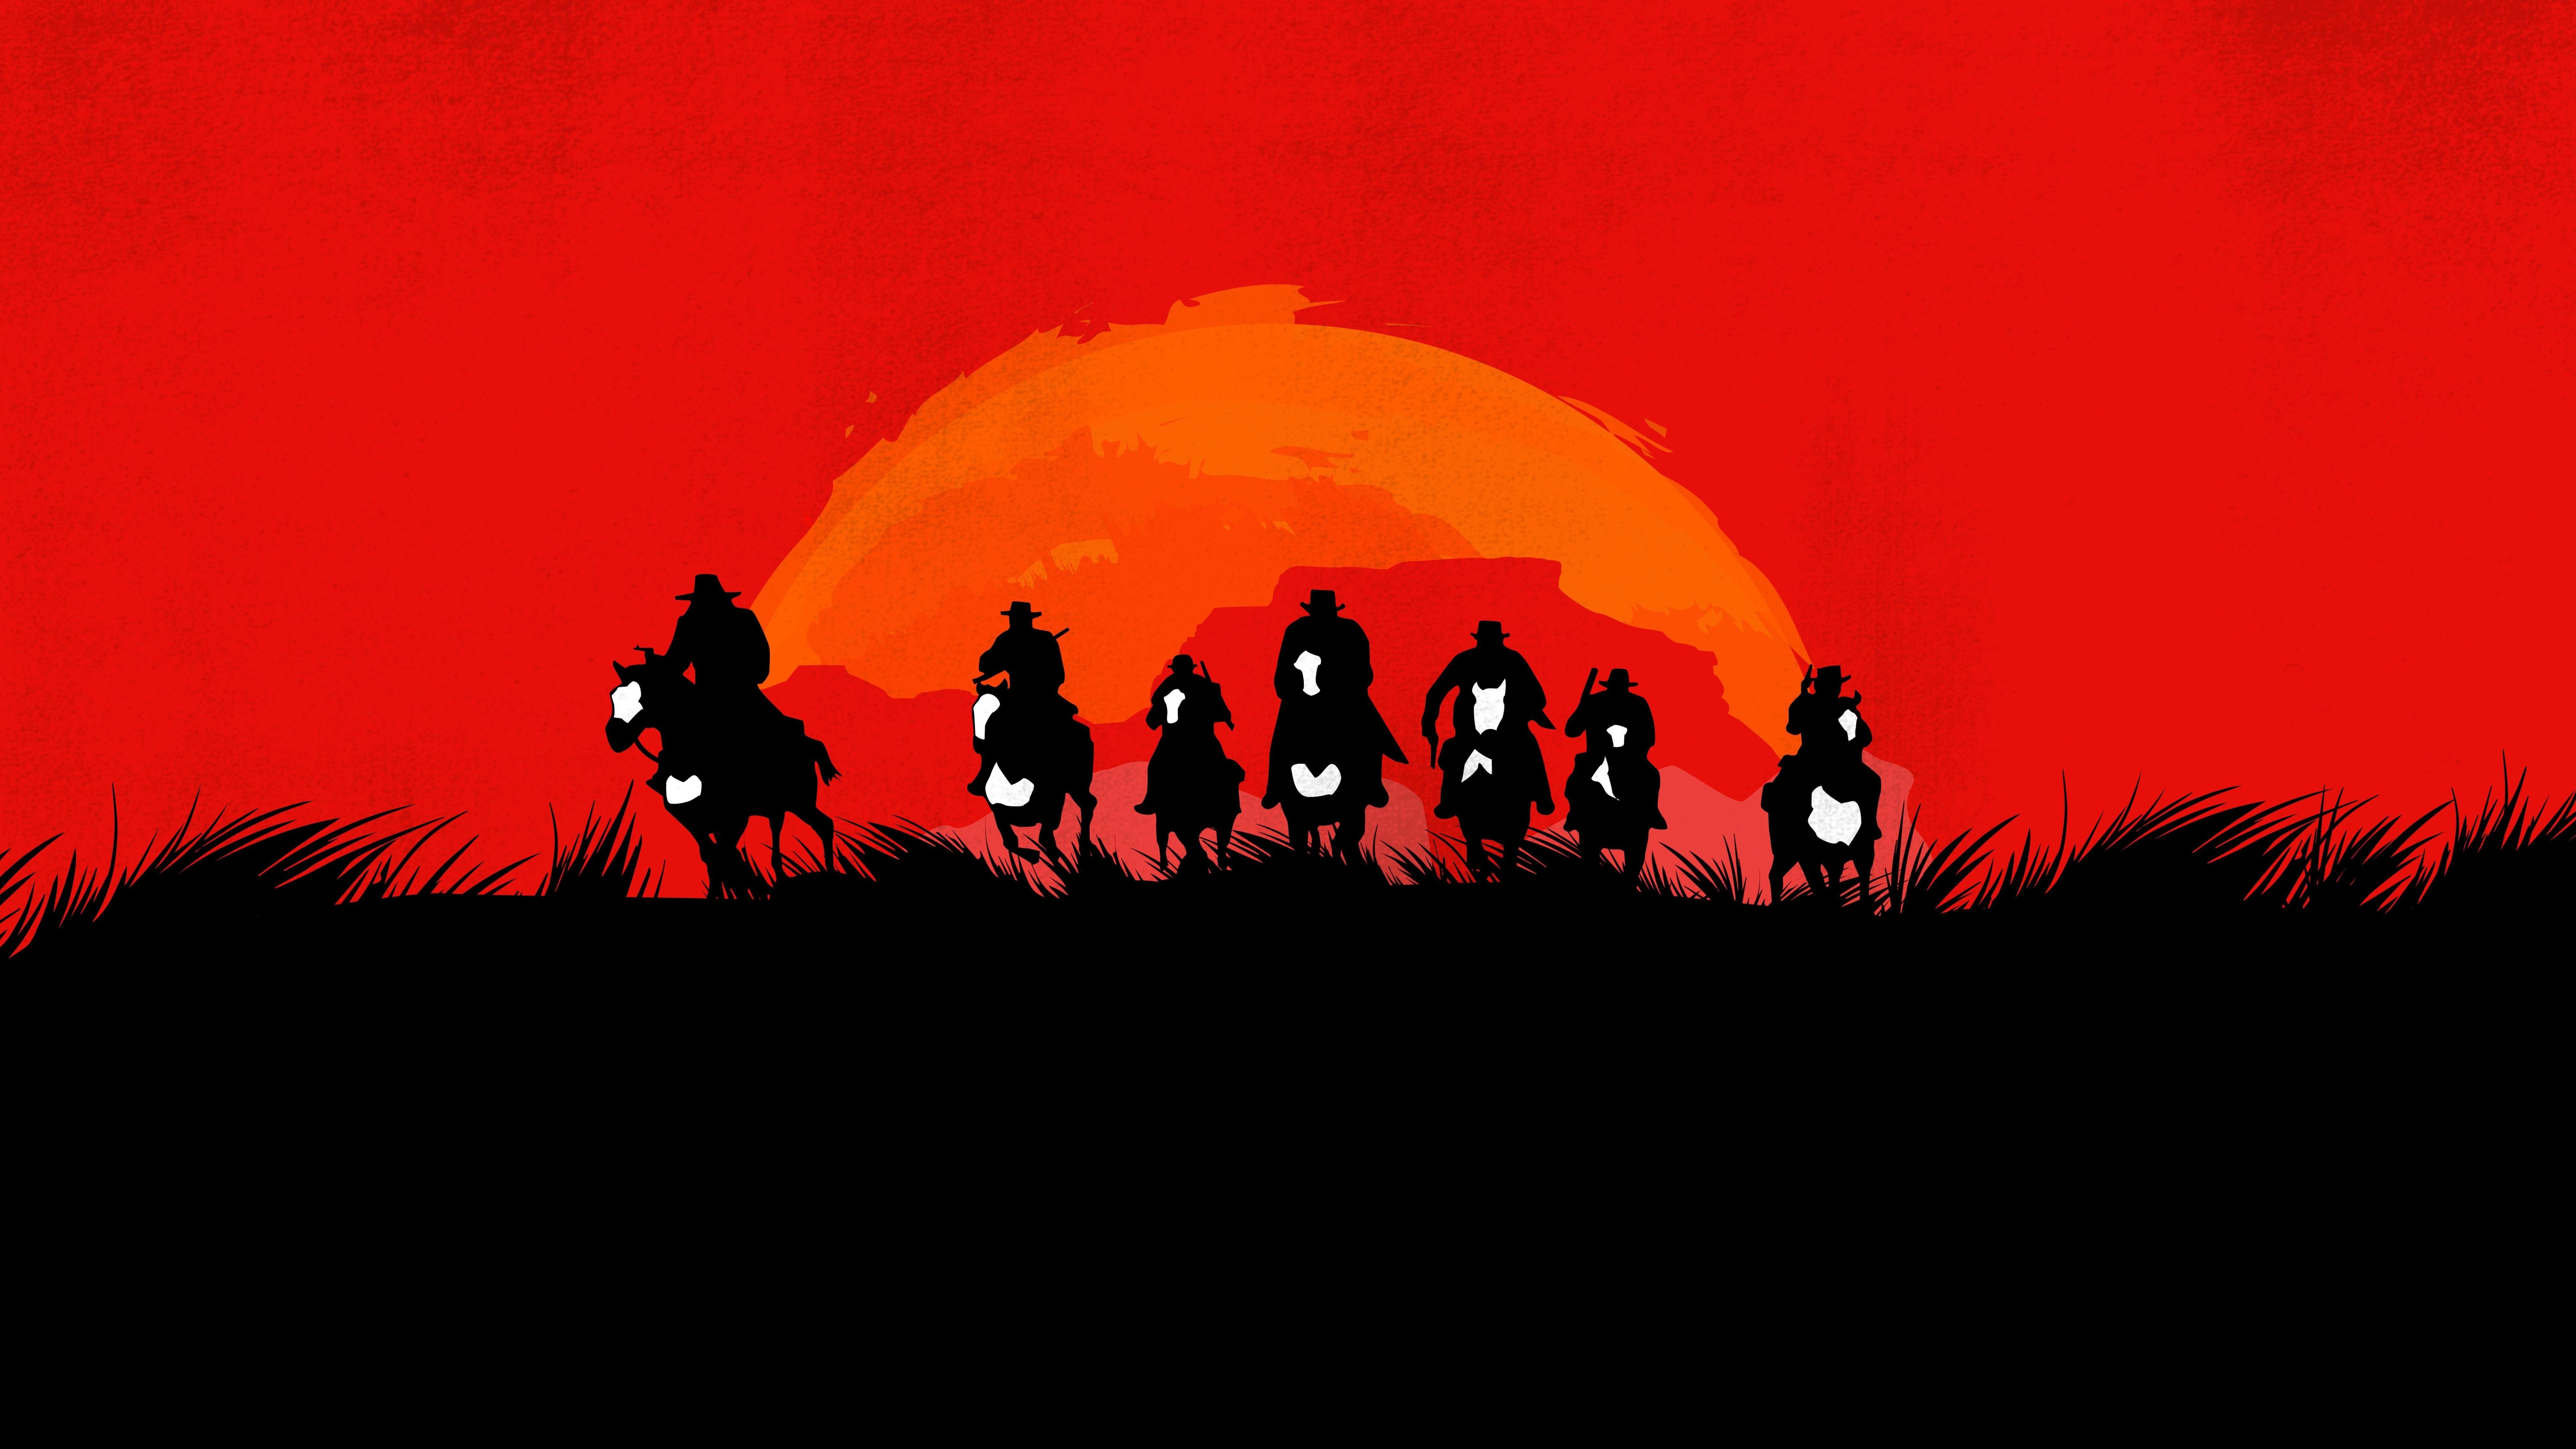 7680x4320 Red Dead Redemption 2 Game 8k Wallpaper Hd Games 4k